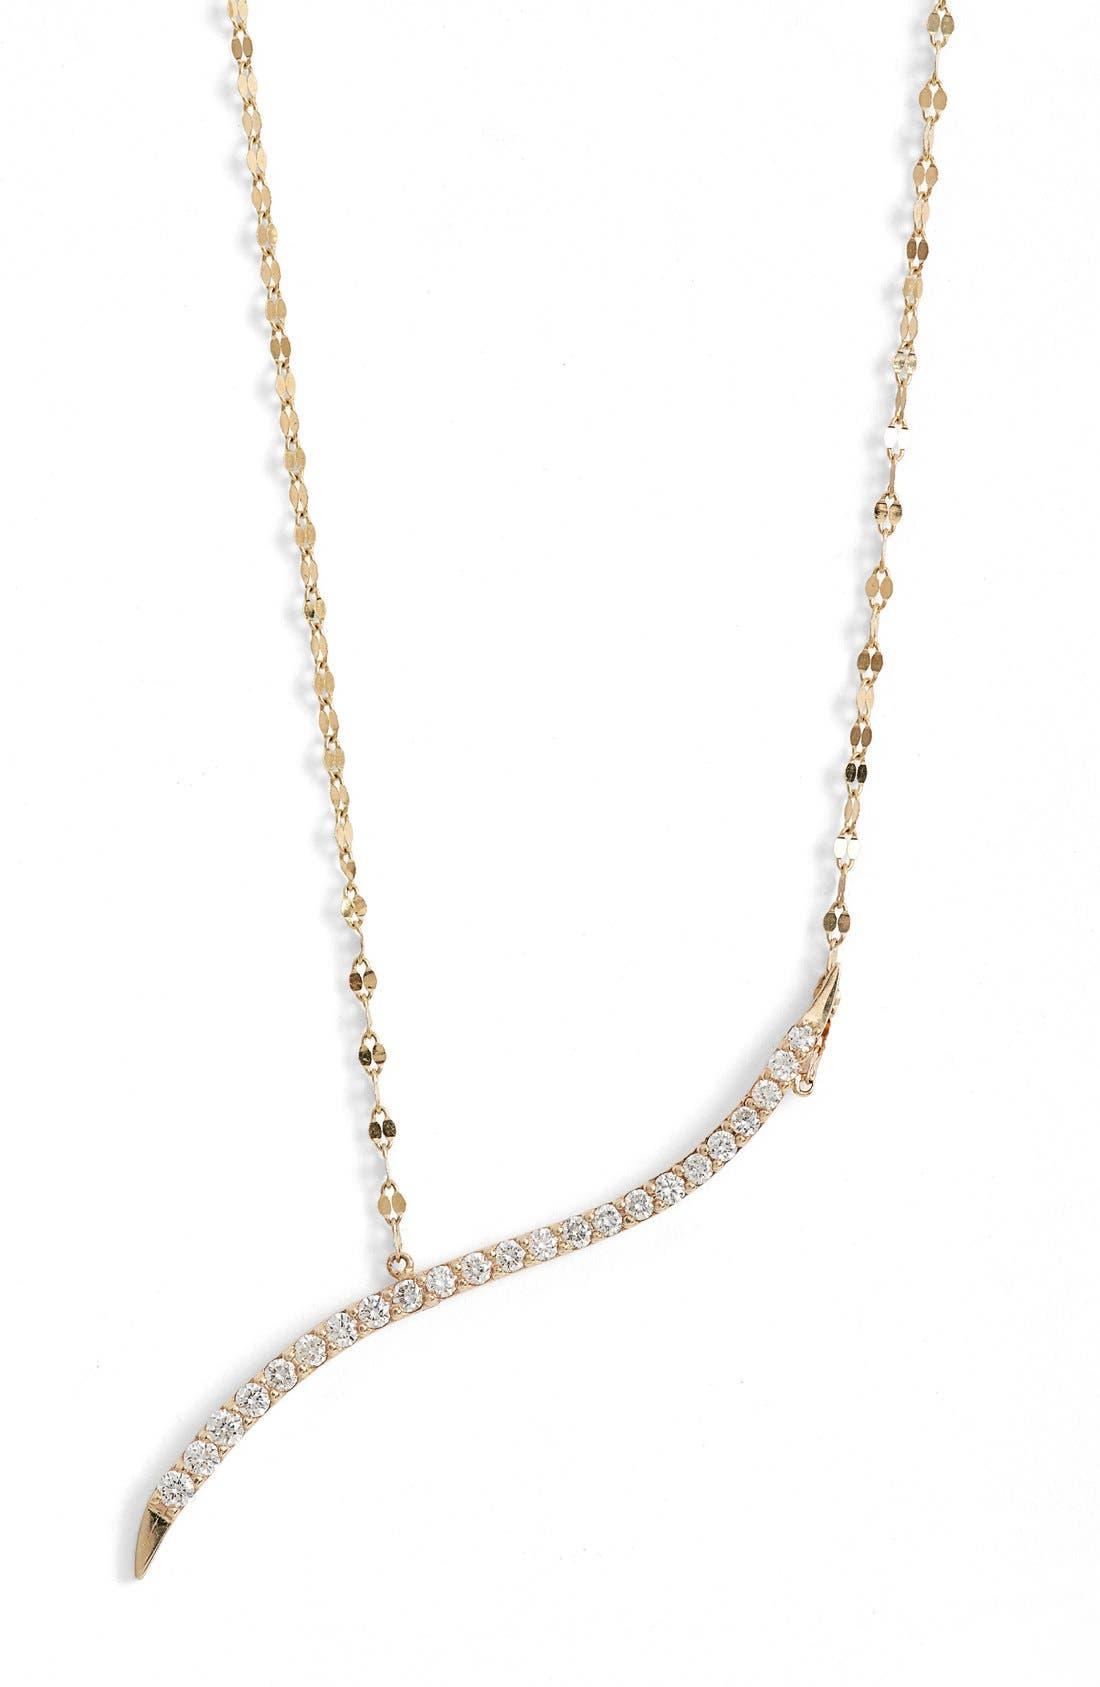 Main Image - Lana Jewelry 'Mirage' Diamond Pendant Necklace